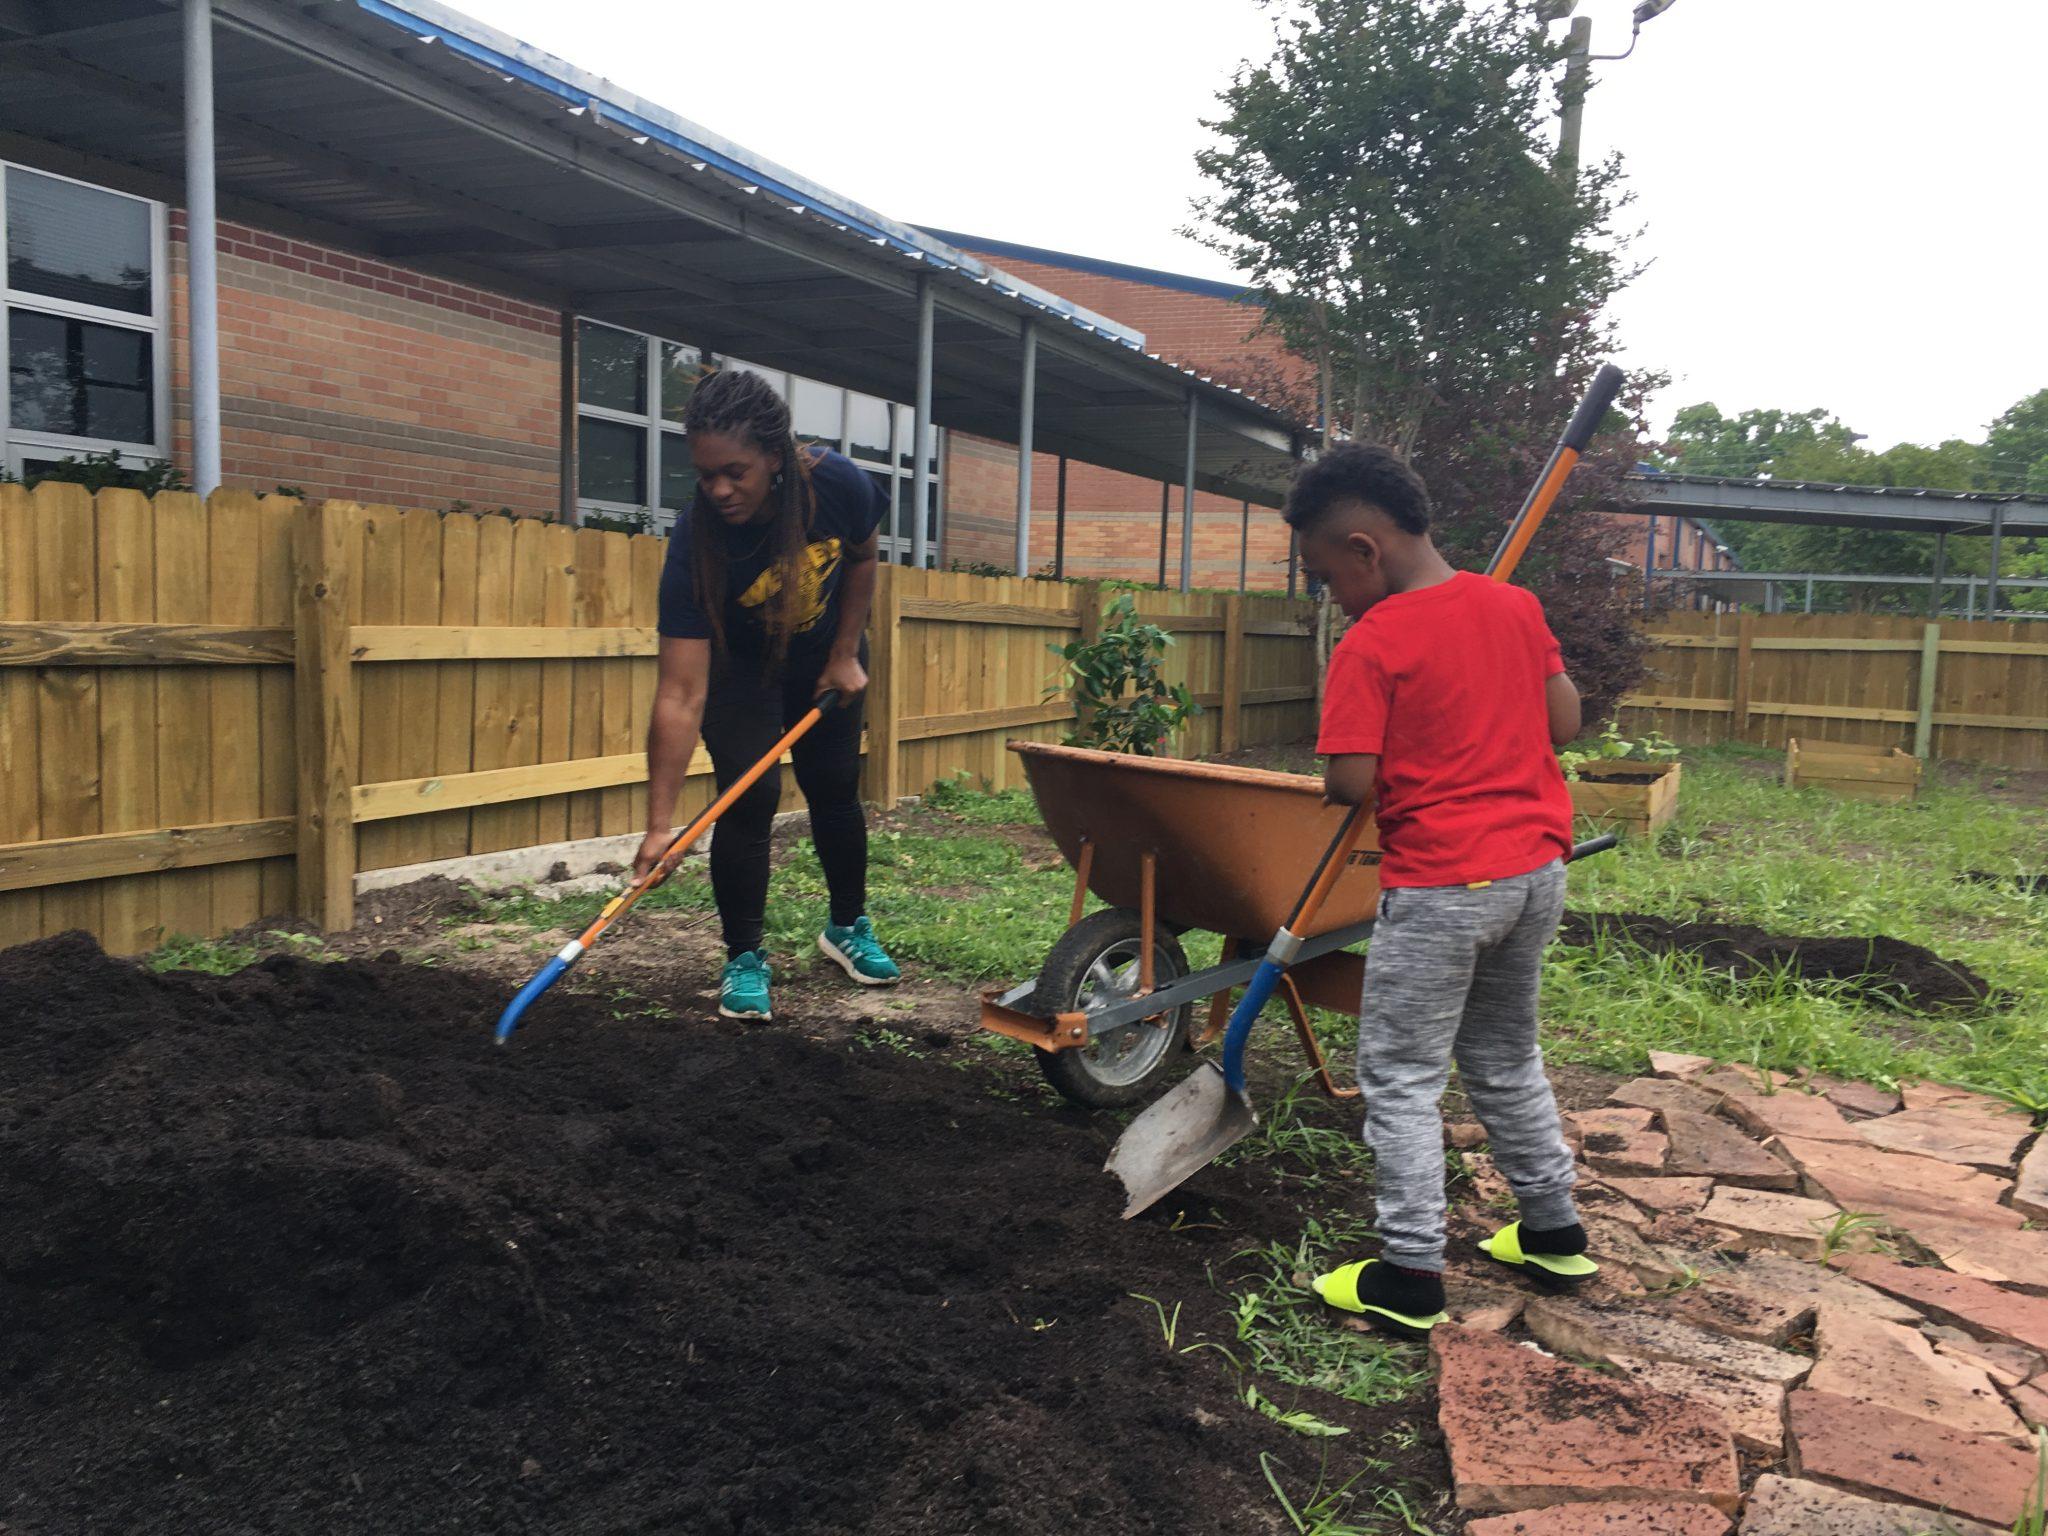 Adopt-A-Garden Kicks Off at Key Gardens